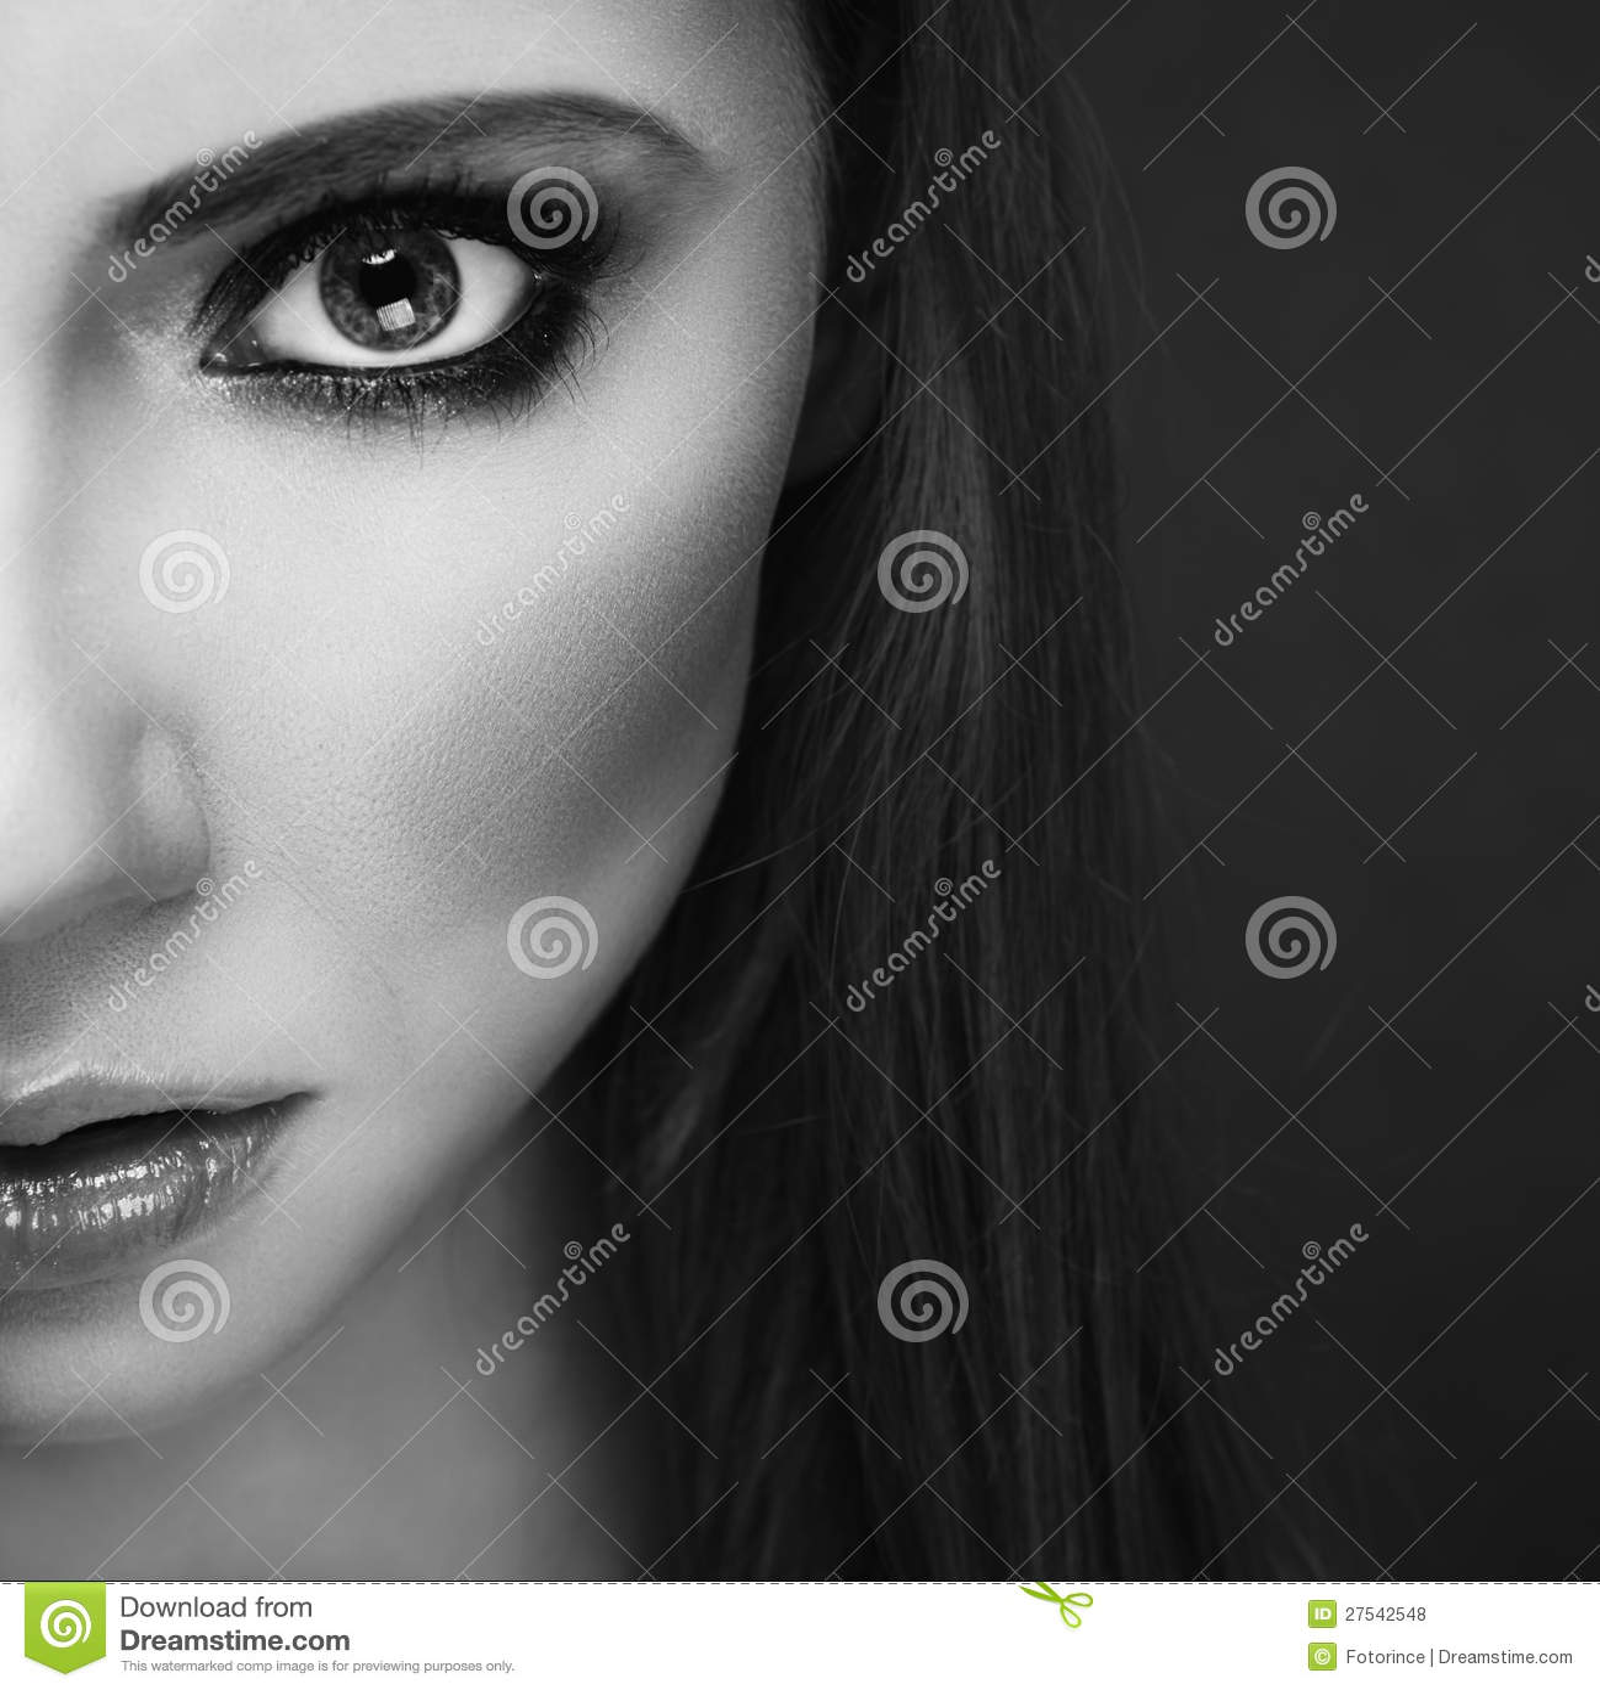 Half Face Portrait Stock Photo. Image Of Eyebrow, Skincare